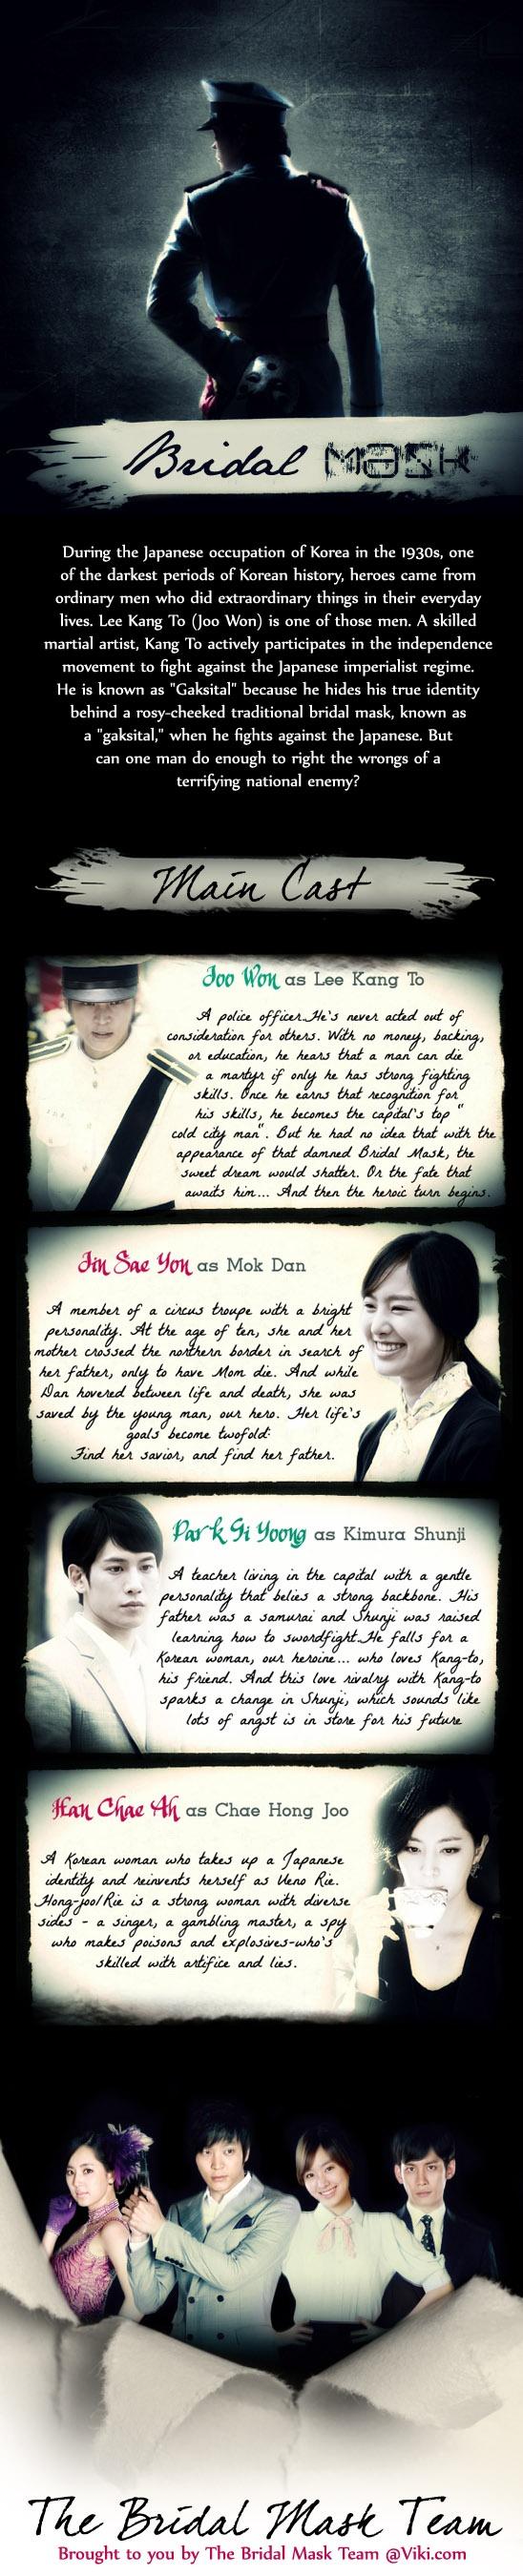 Korean - Bridal Mask Such an awesome drama!